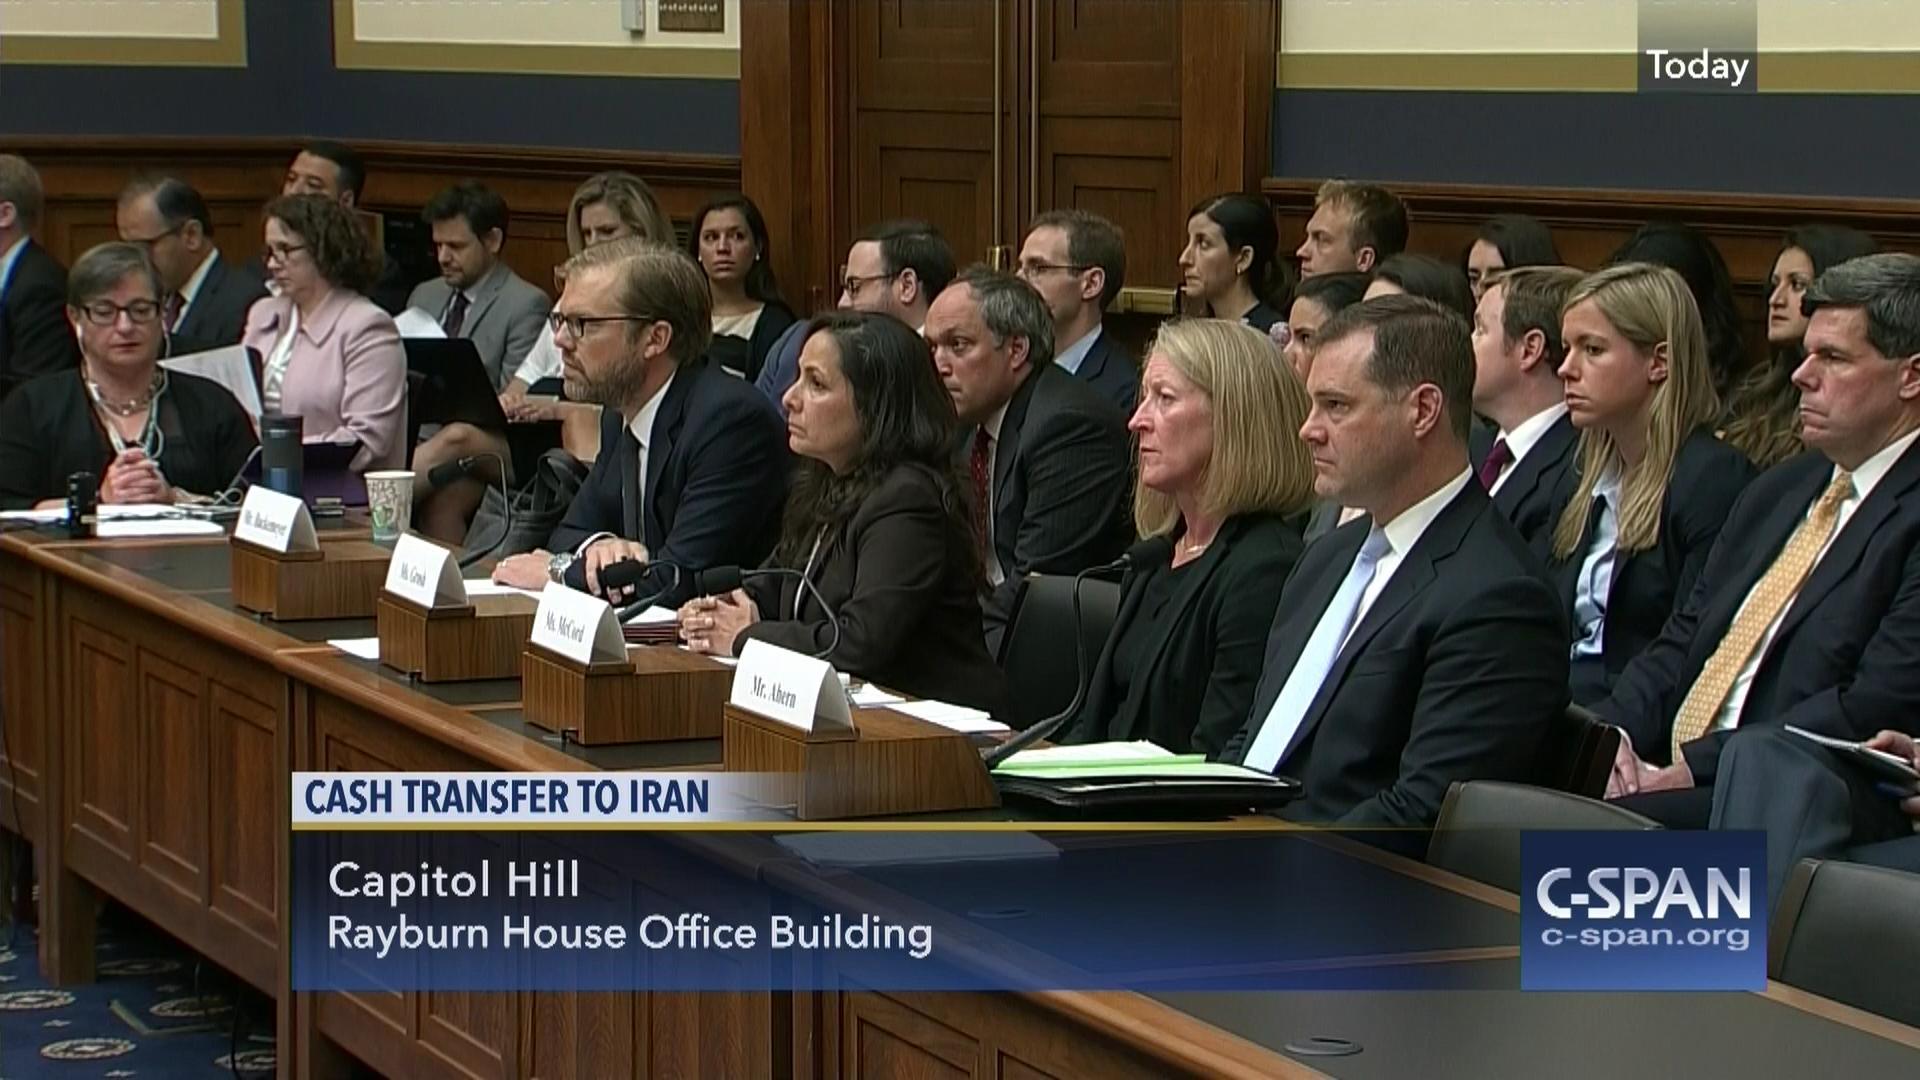 hearing focuses payments iran, sep 8 2016 | video | c-span